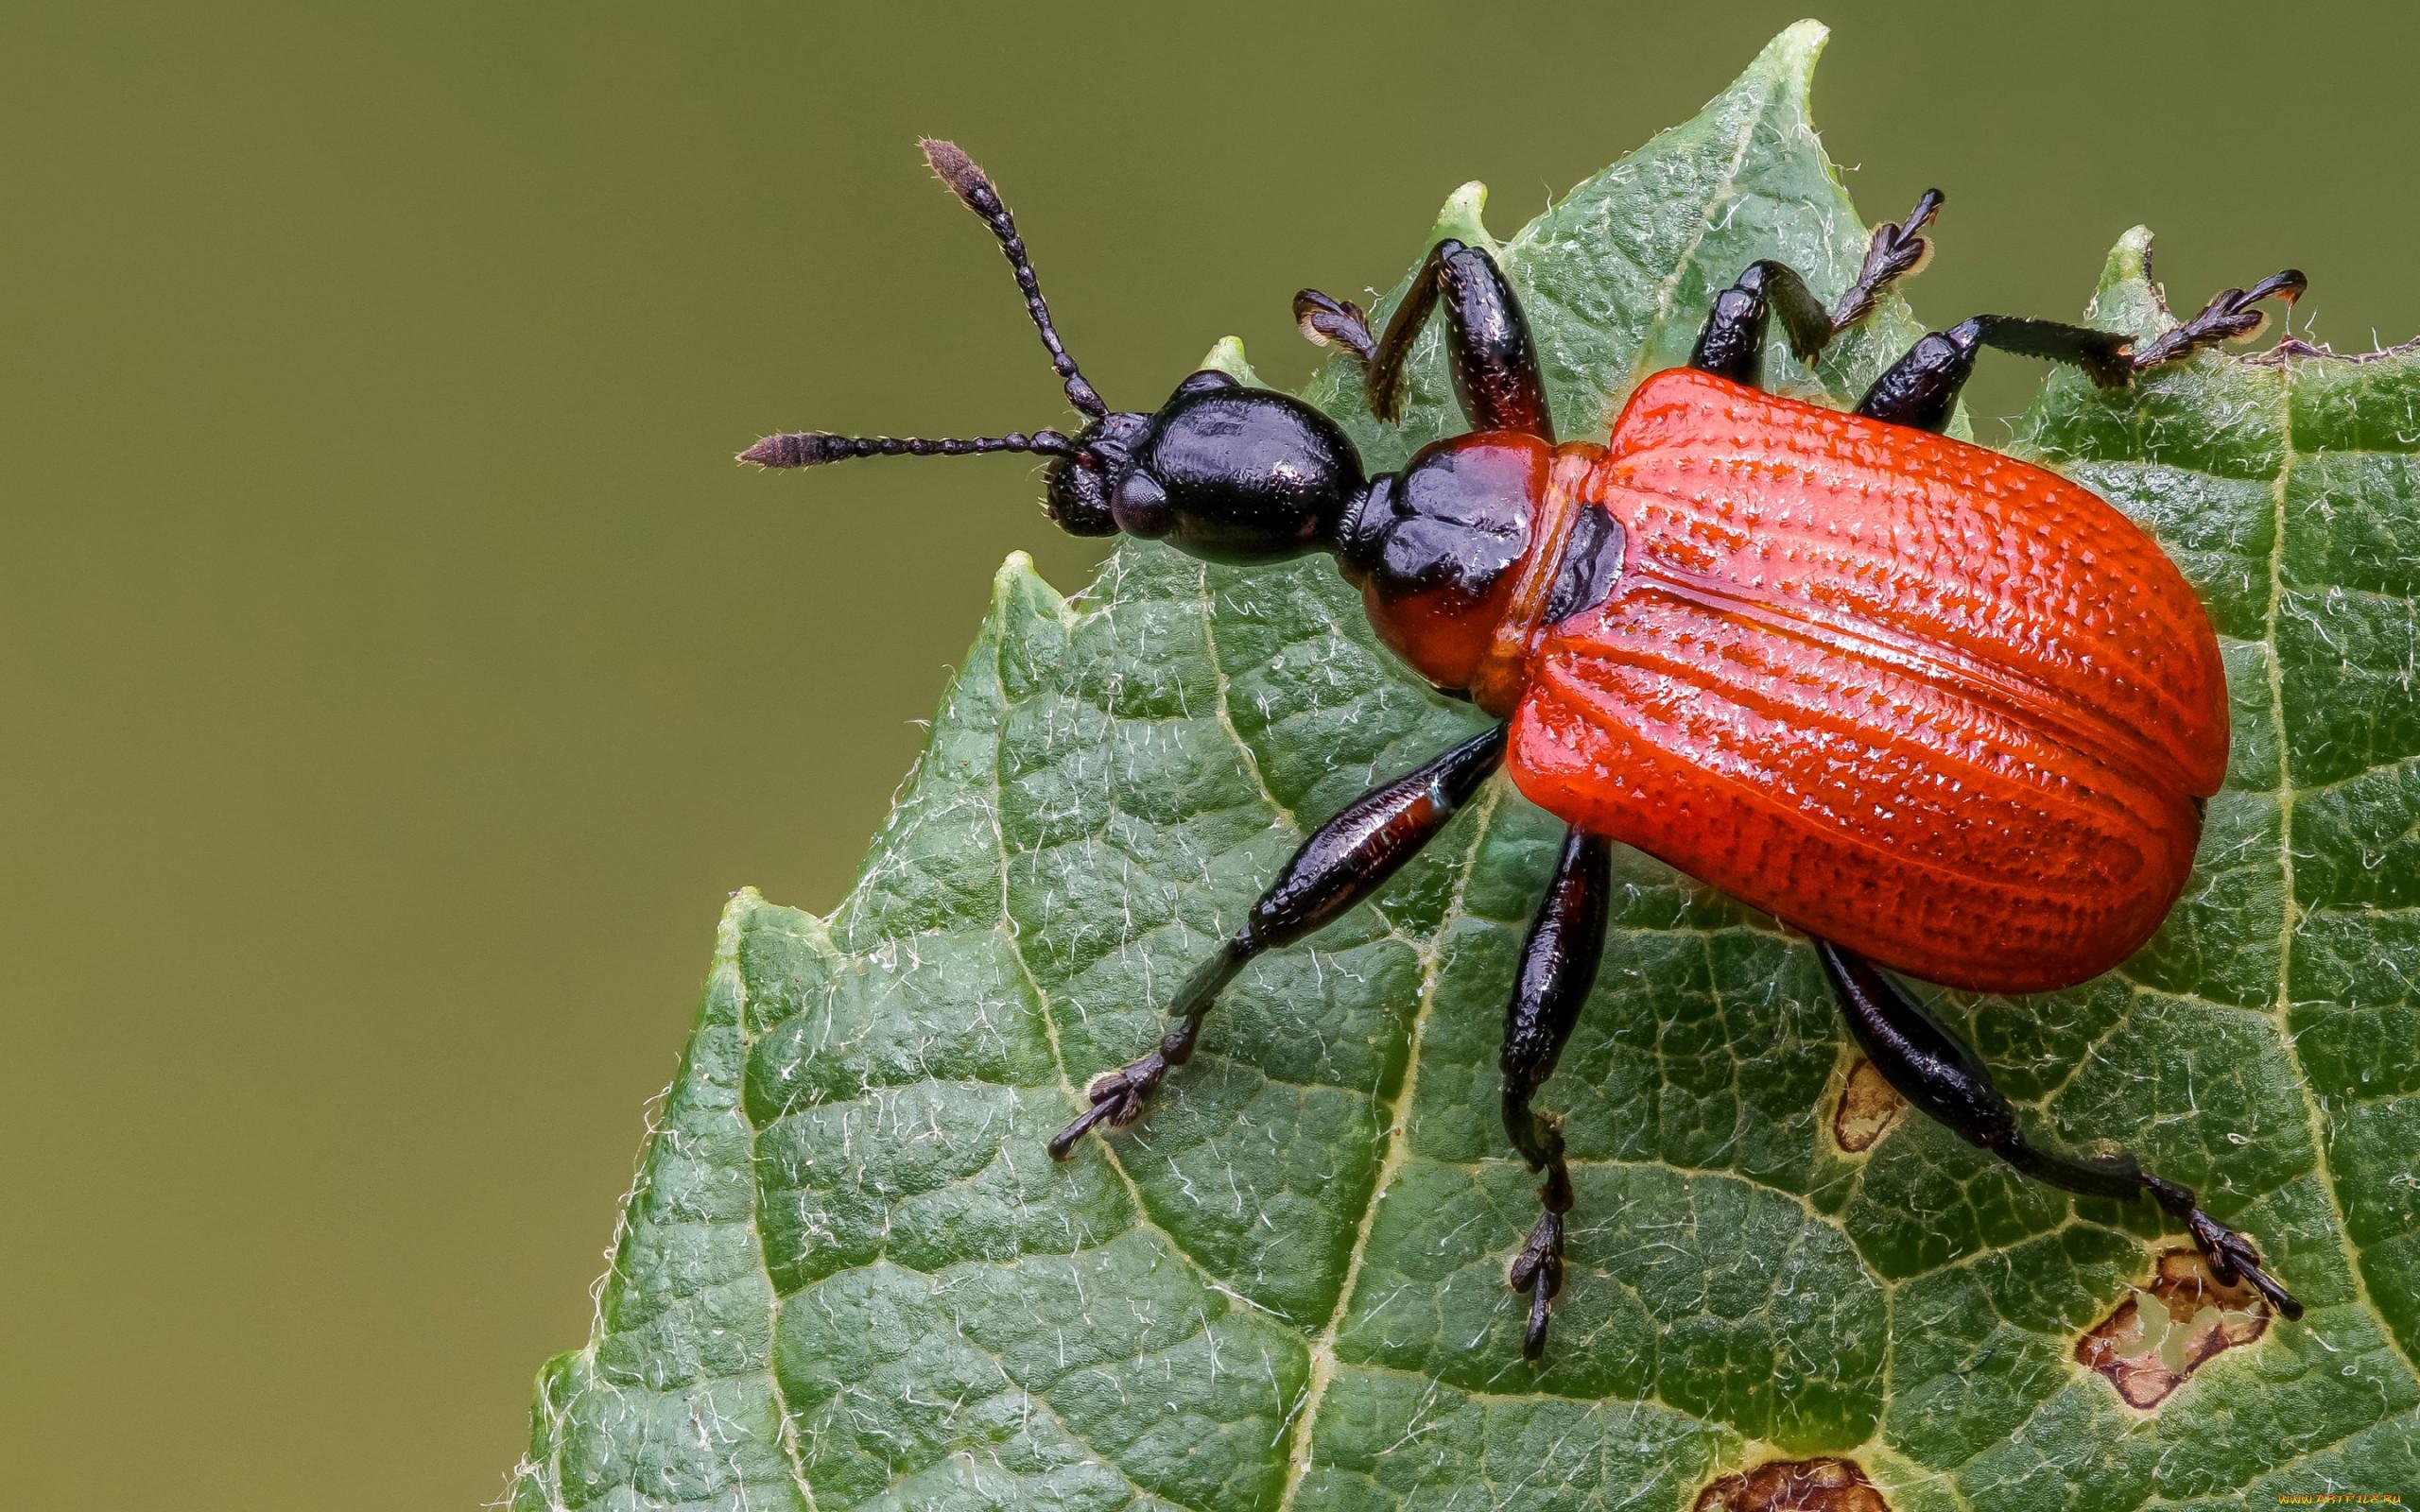 HDoboi.Kiev.ua - Красный жук на листе, заставки на телефон андроид животное